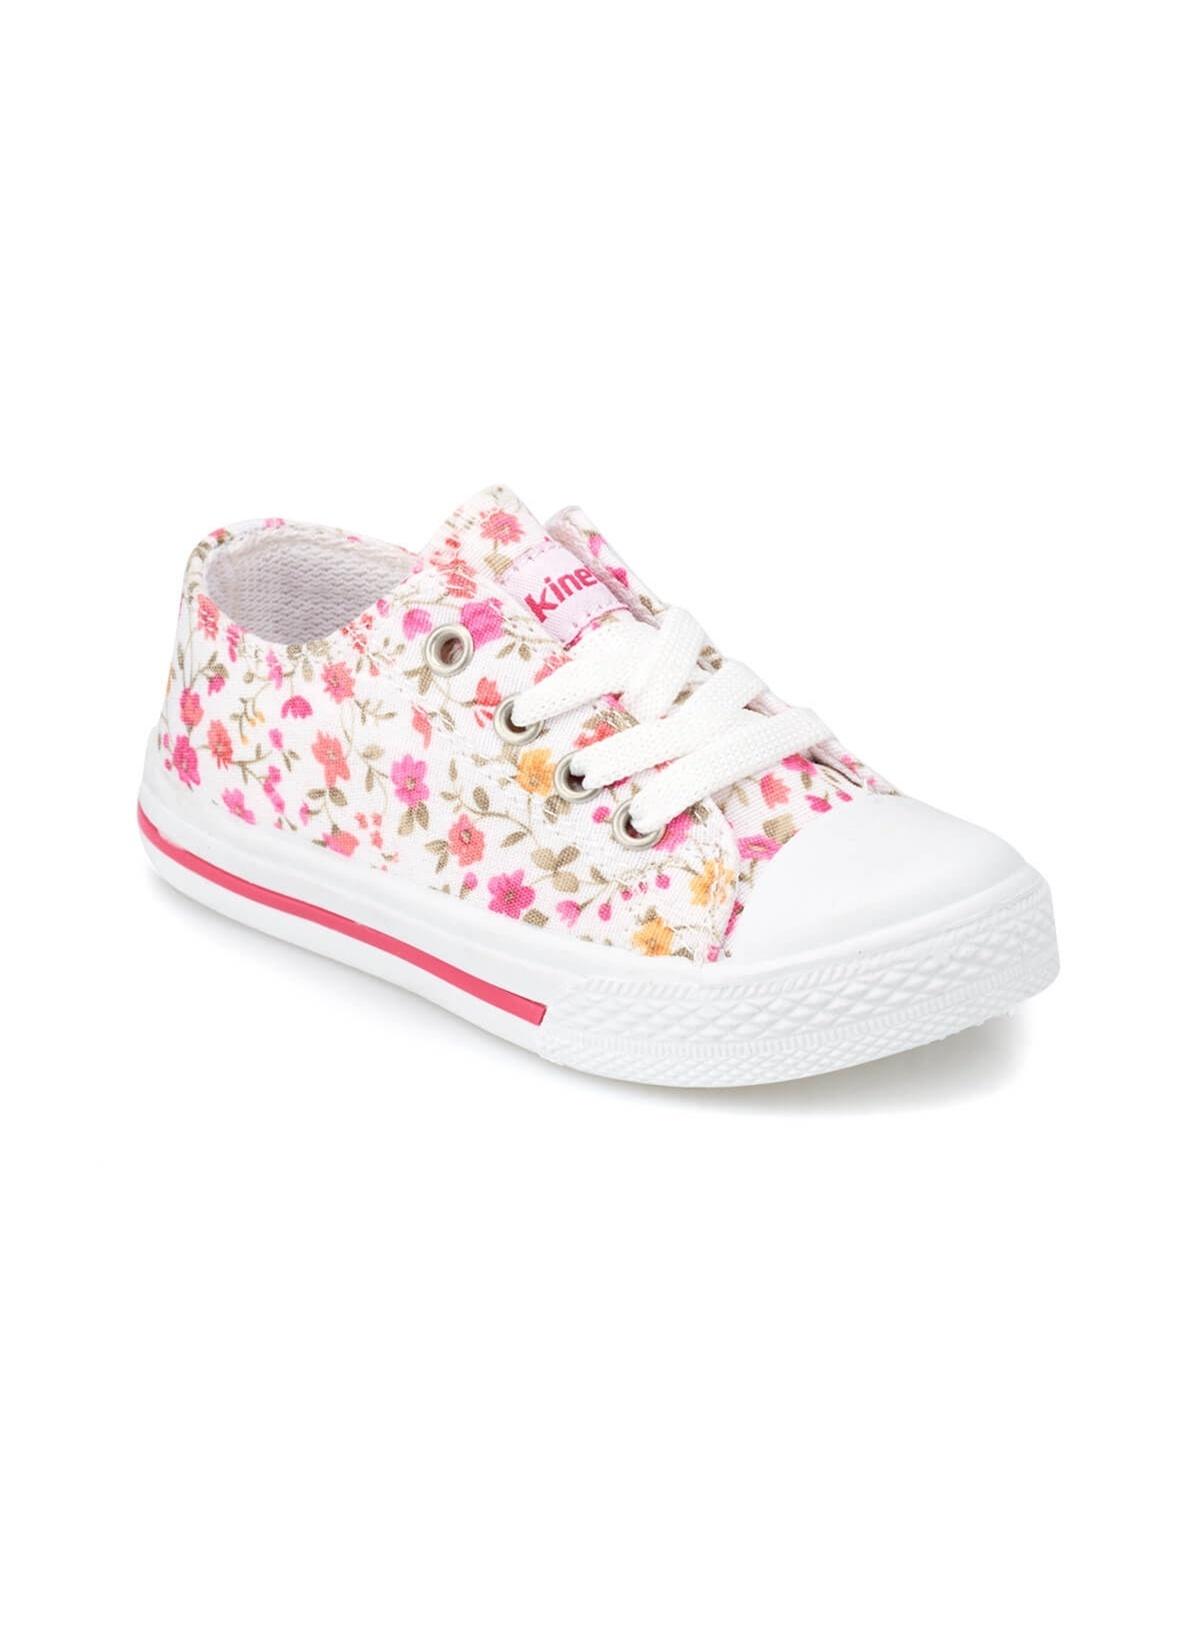 Kinetix Sneakers Denni F Sneaker – 29.99 TL